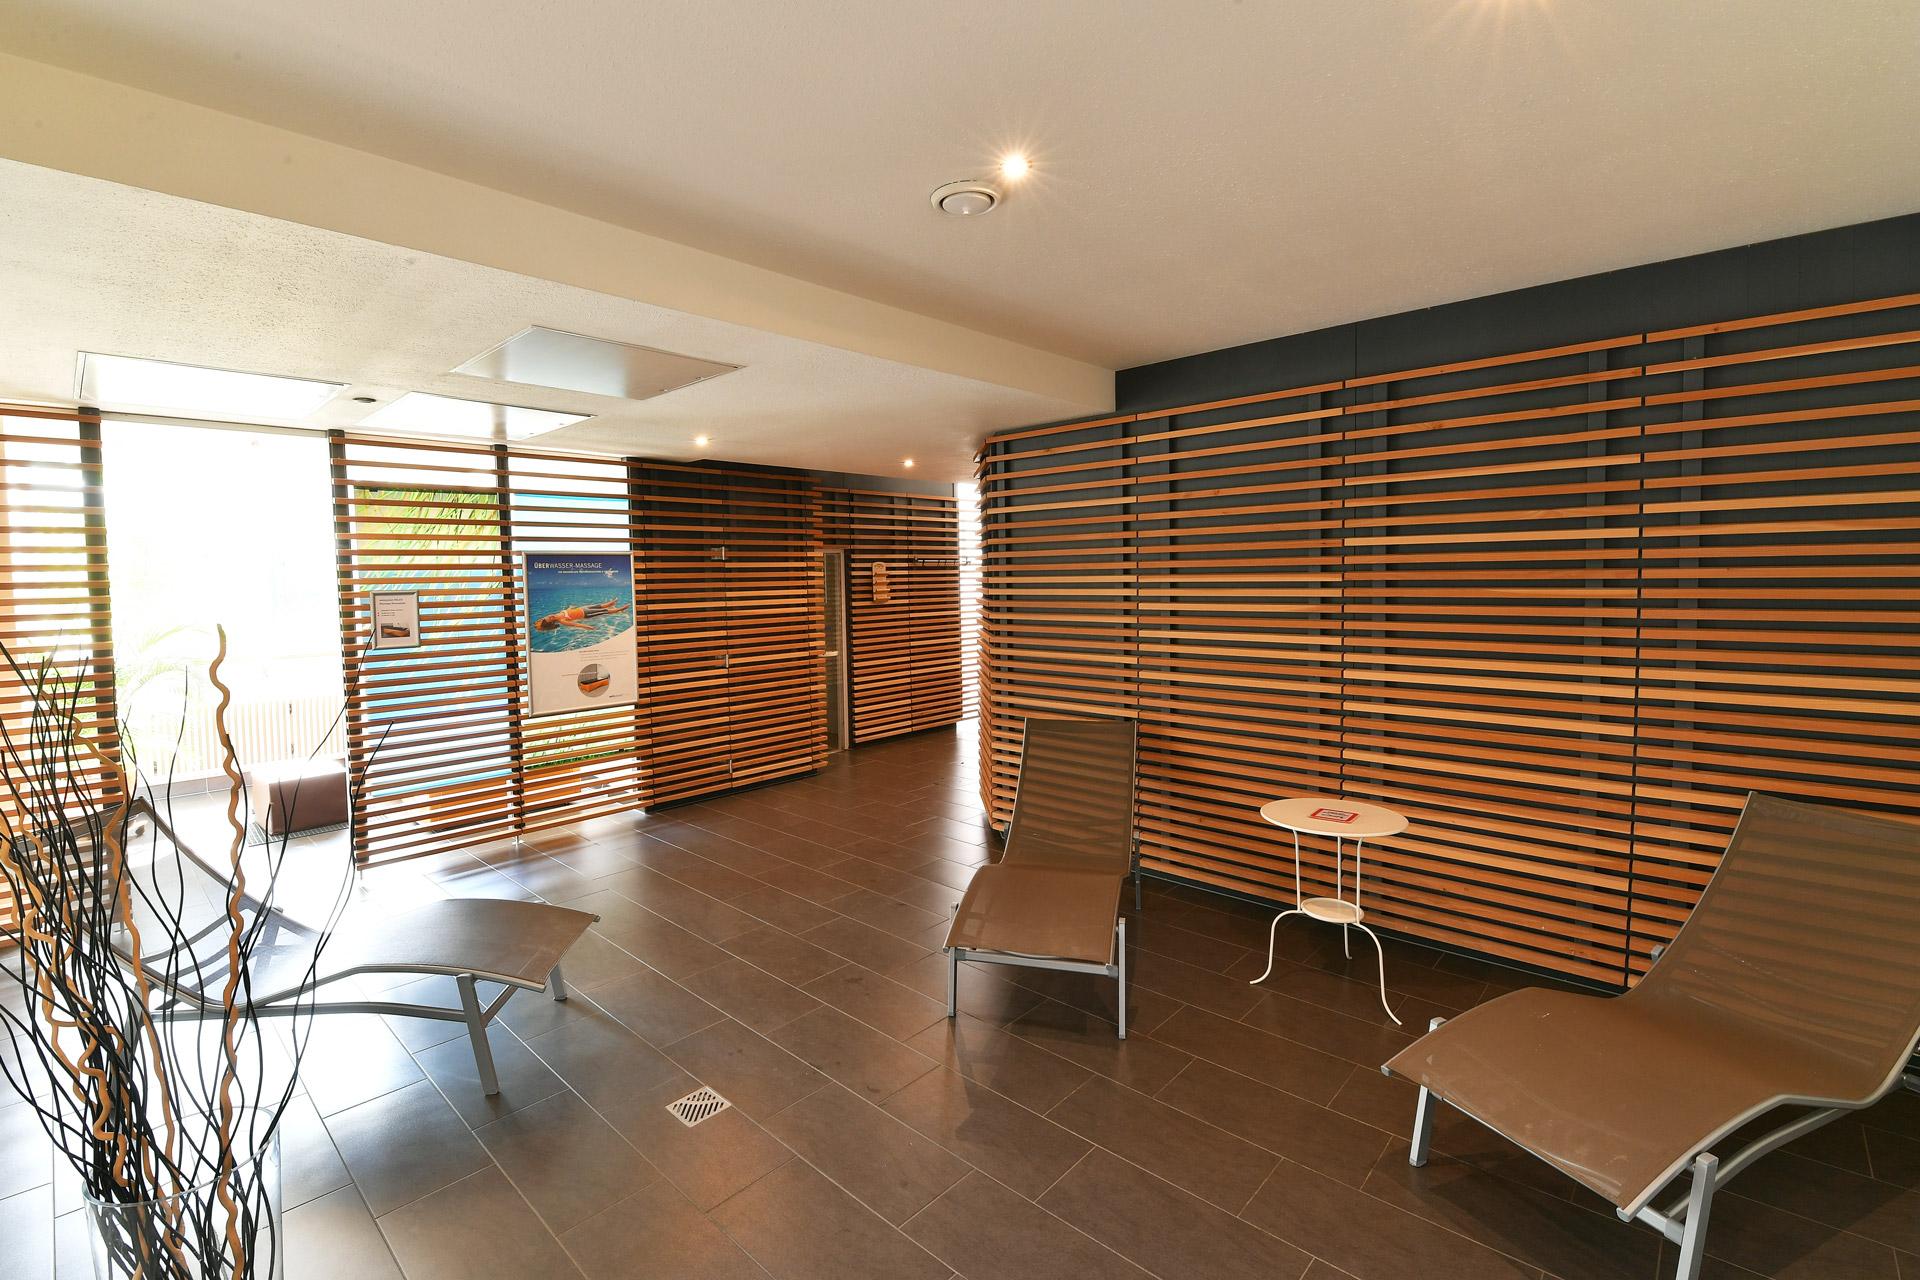 ruhezone-sauna-sportpark-hugstetten-1920x1280px